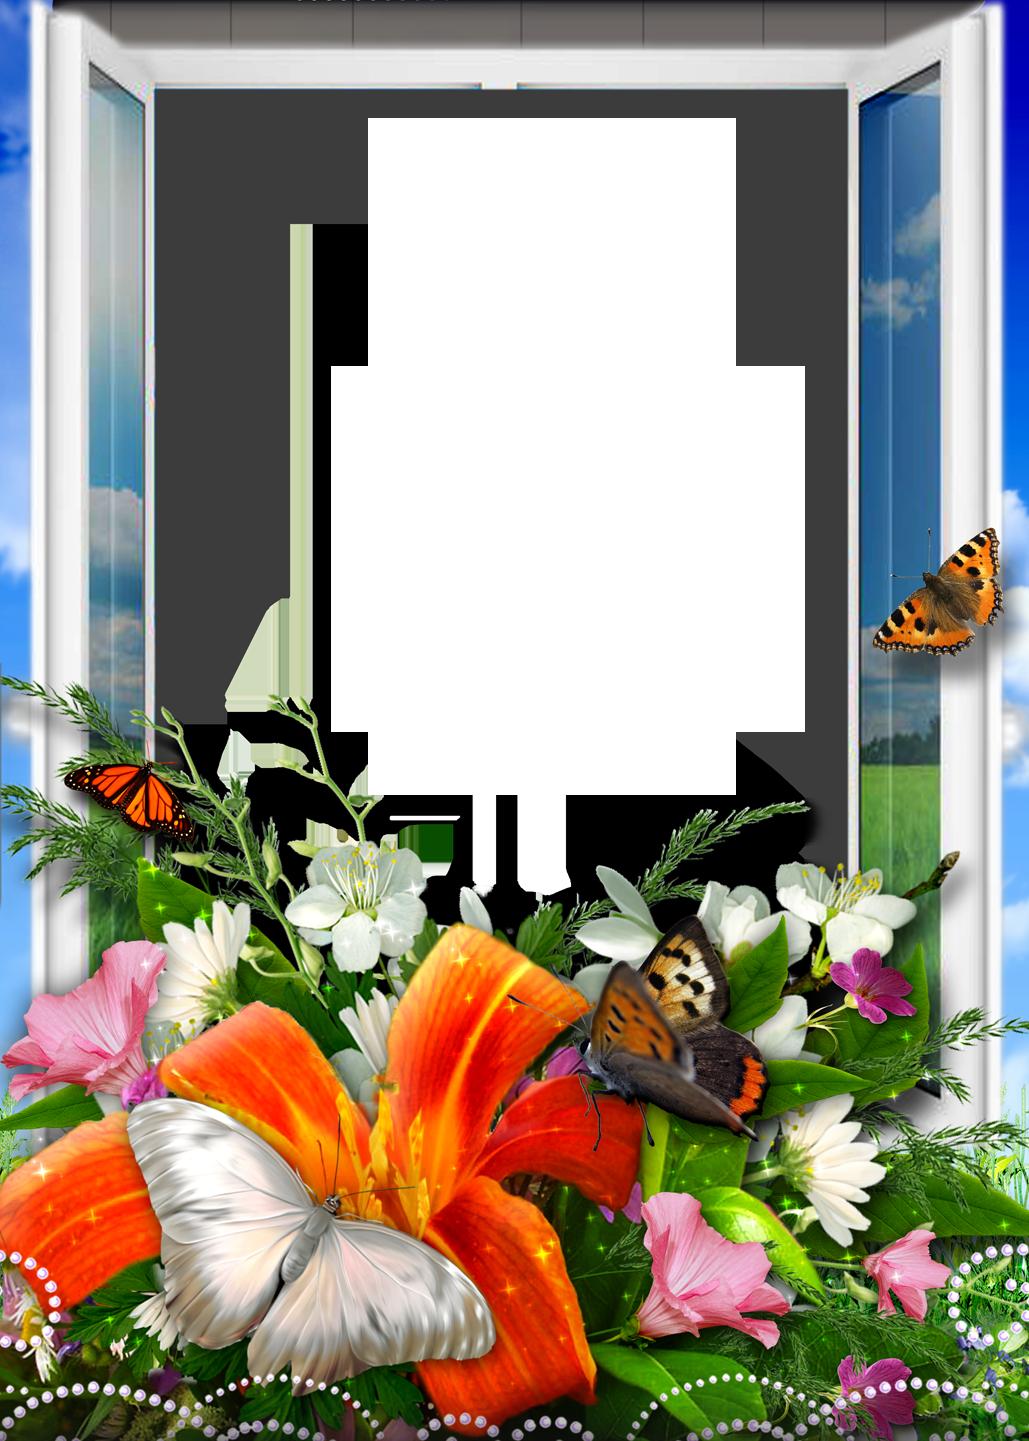 http://img-fotki.yandex.ru/get/4132/41771327.36c/0_89a8a_e092e855_orig.png